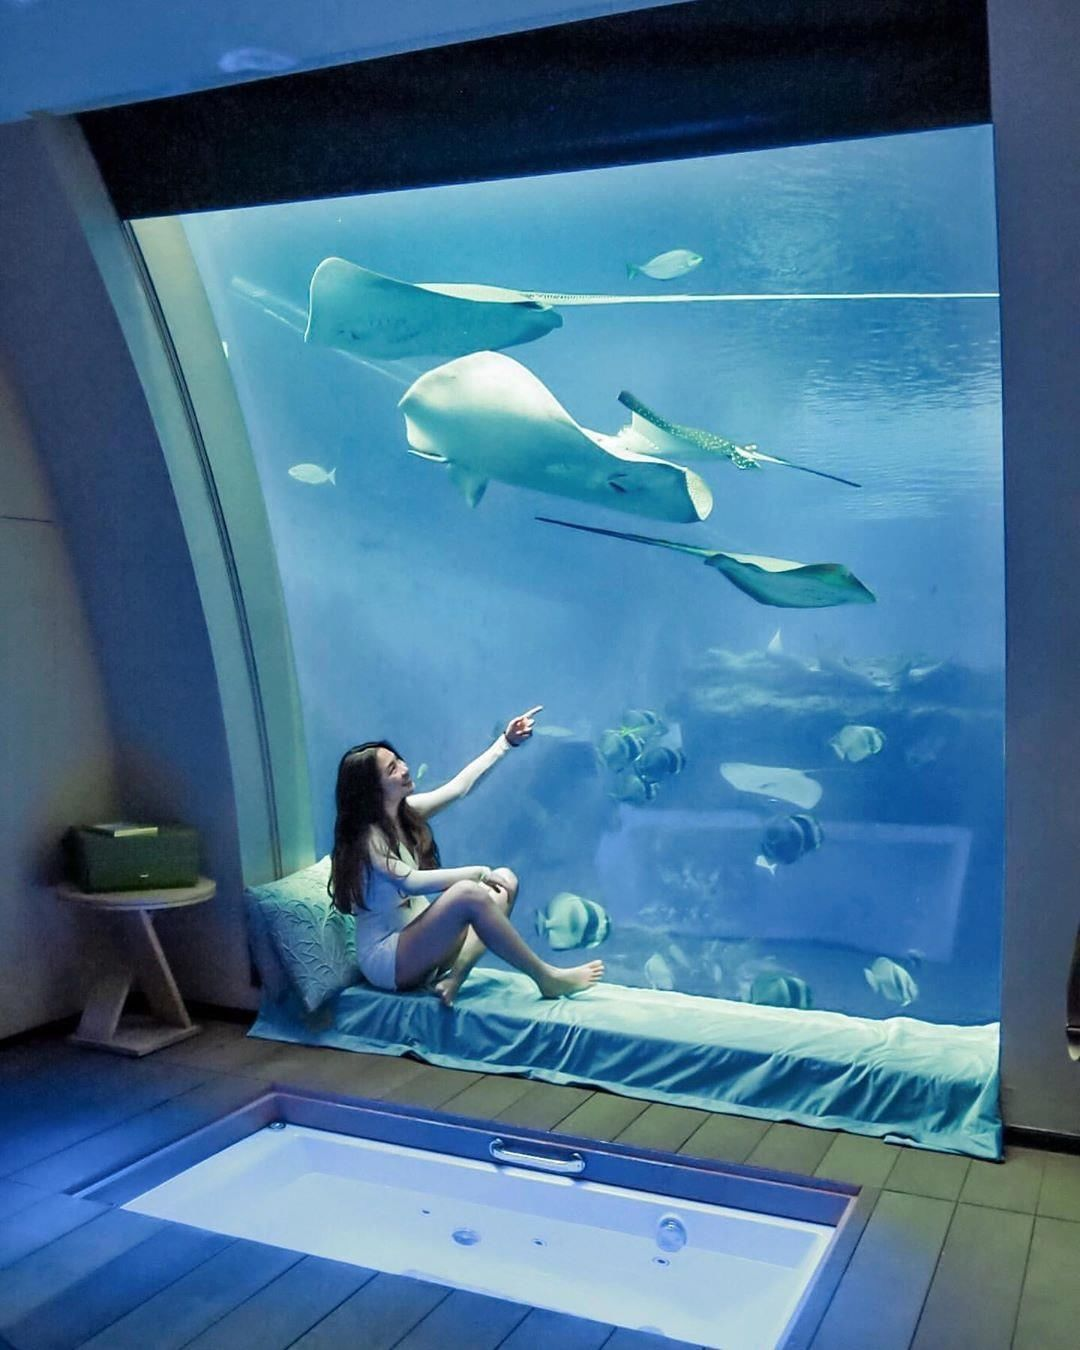 Underwater hotels near Singapore